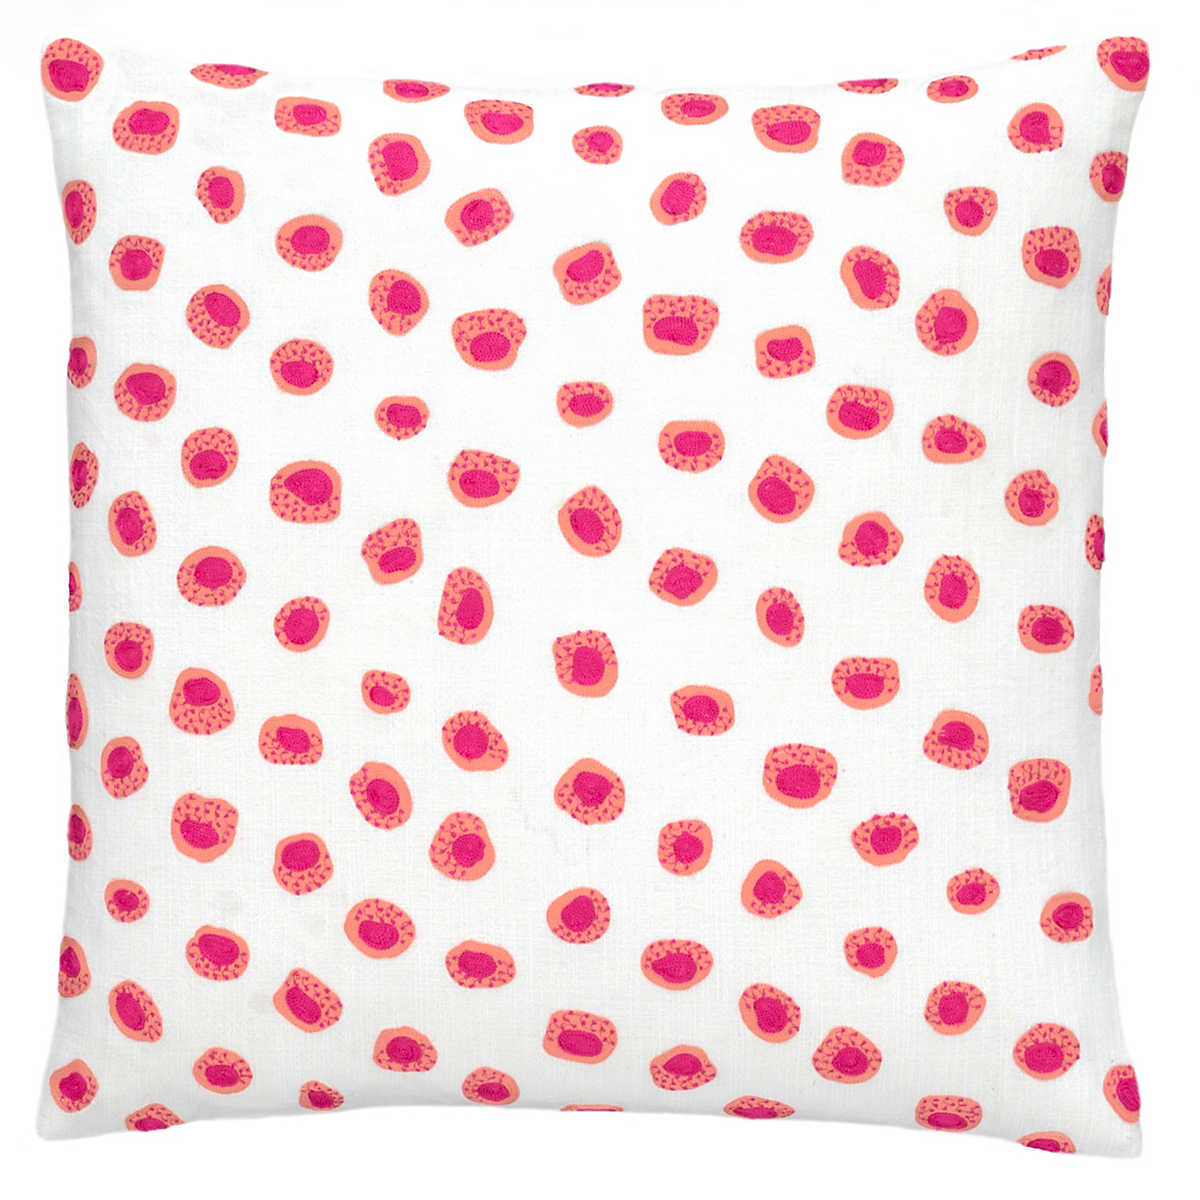 thumbprint coralfuchsia embroidered decorative pillow - Coral Decorative Pillows